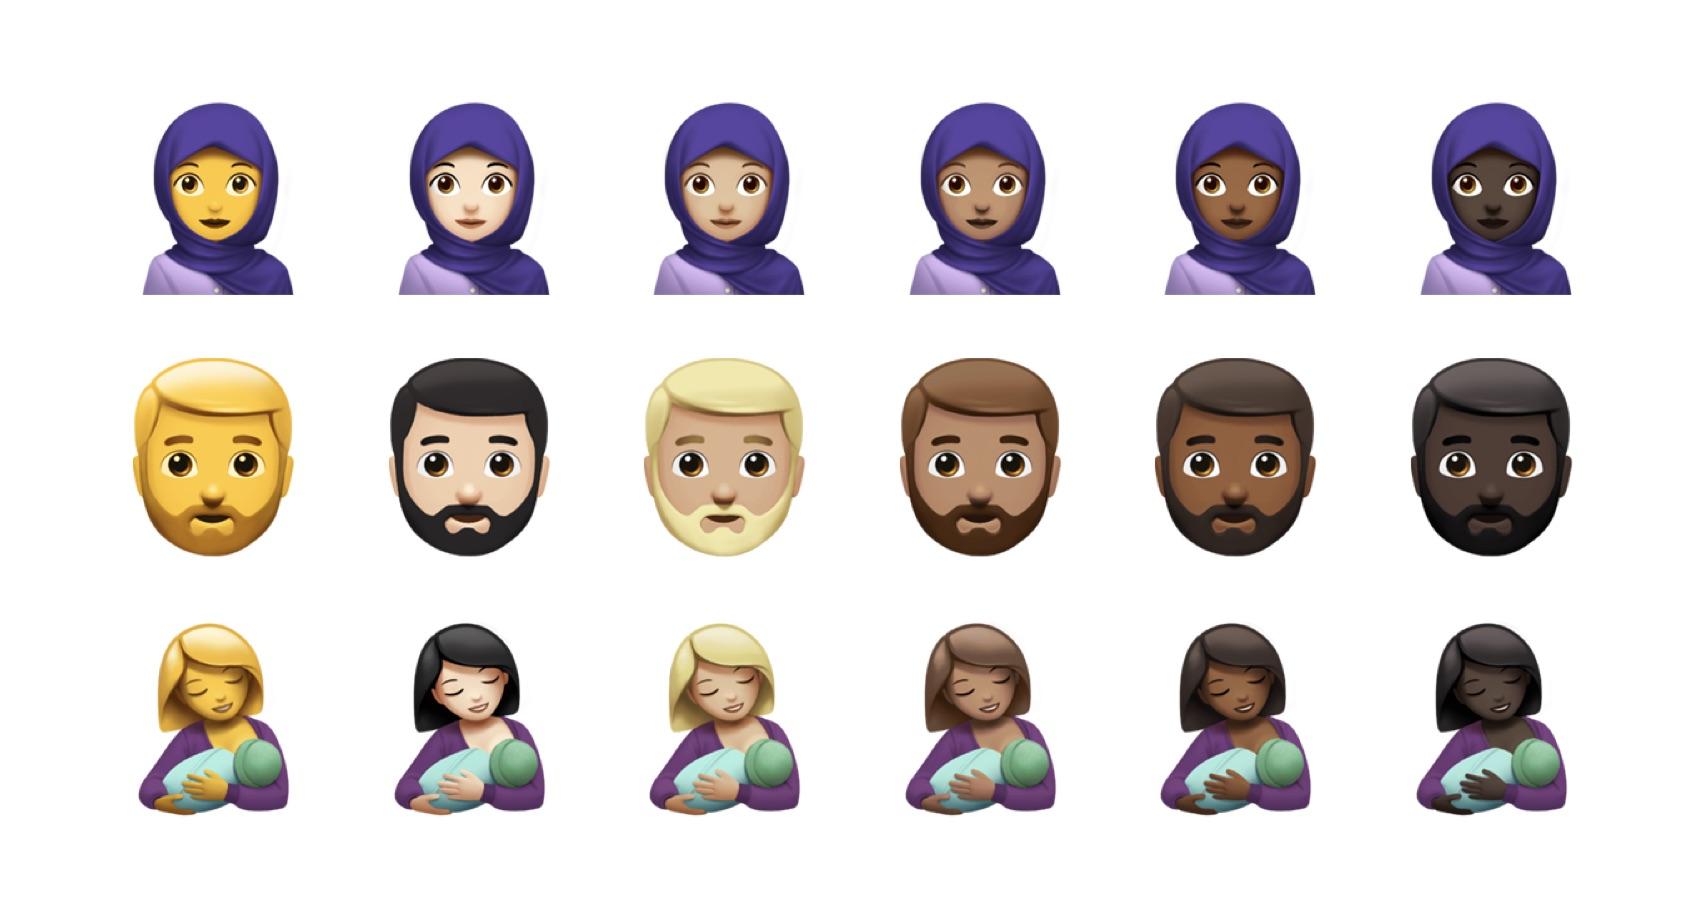 headscarf-beard-breastfeeding-emojis-ios-11-1-emojipedia